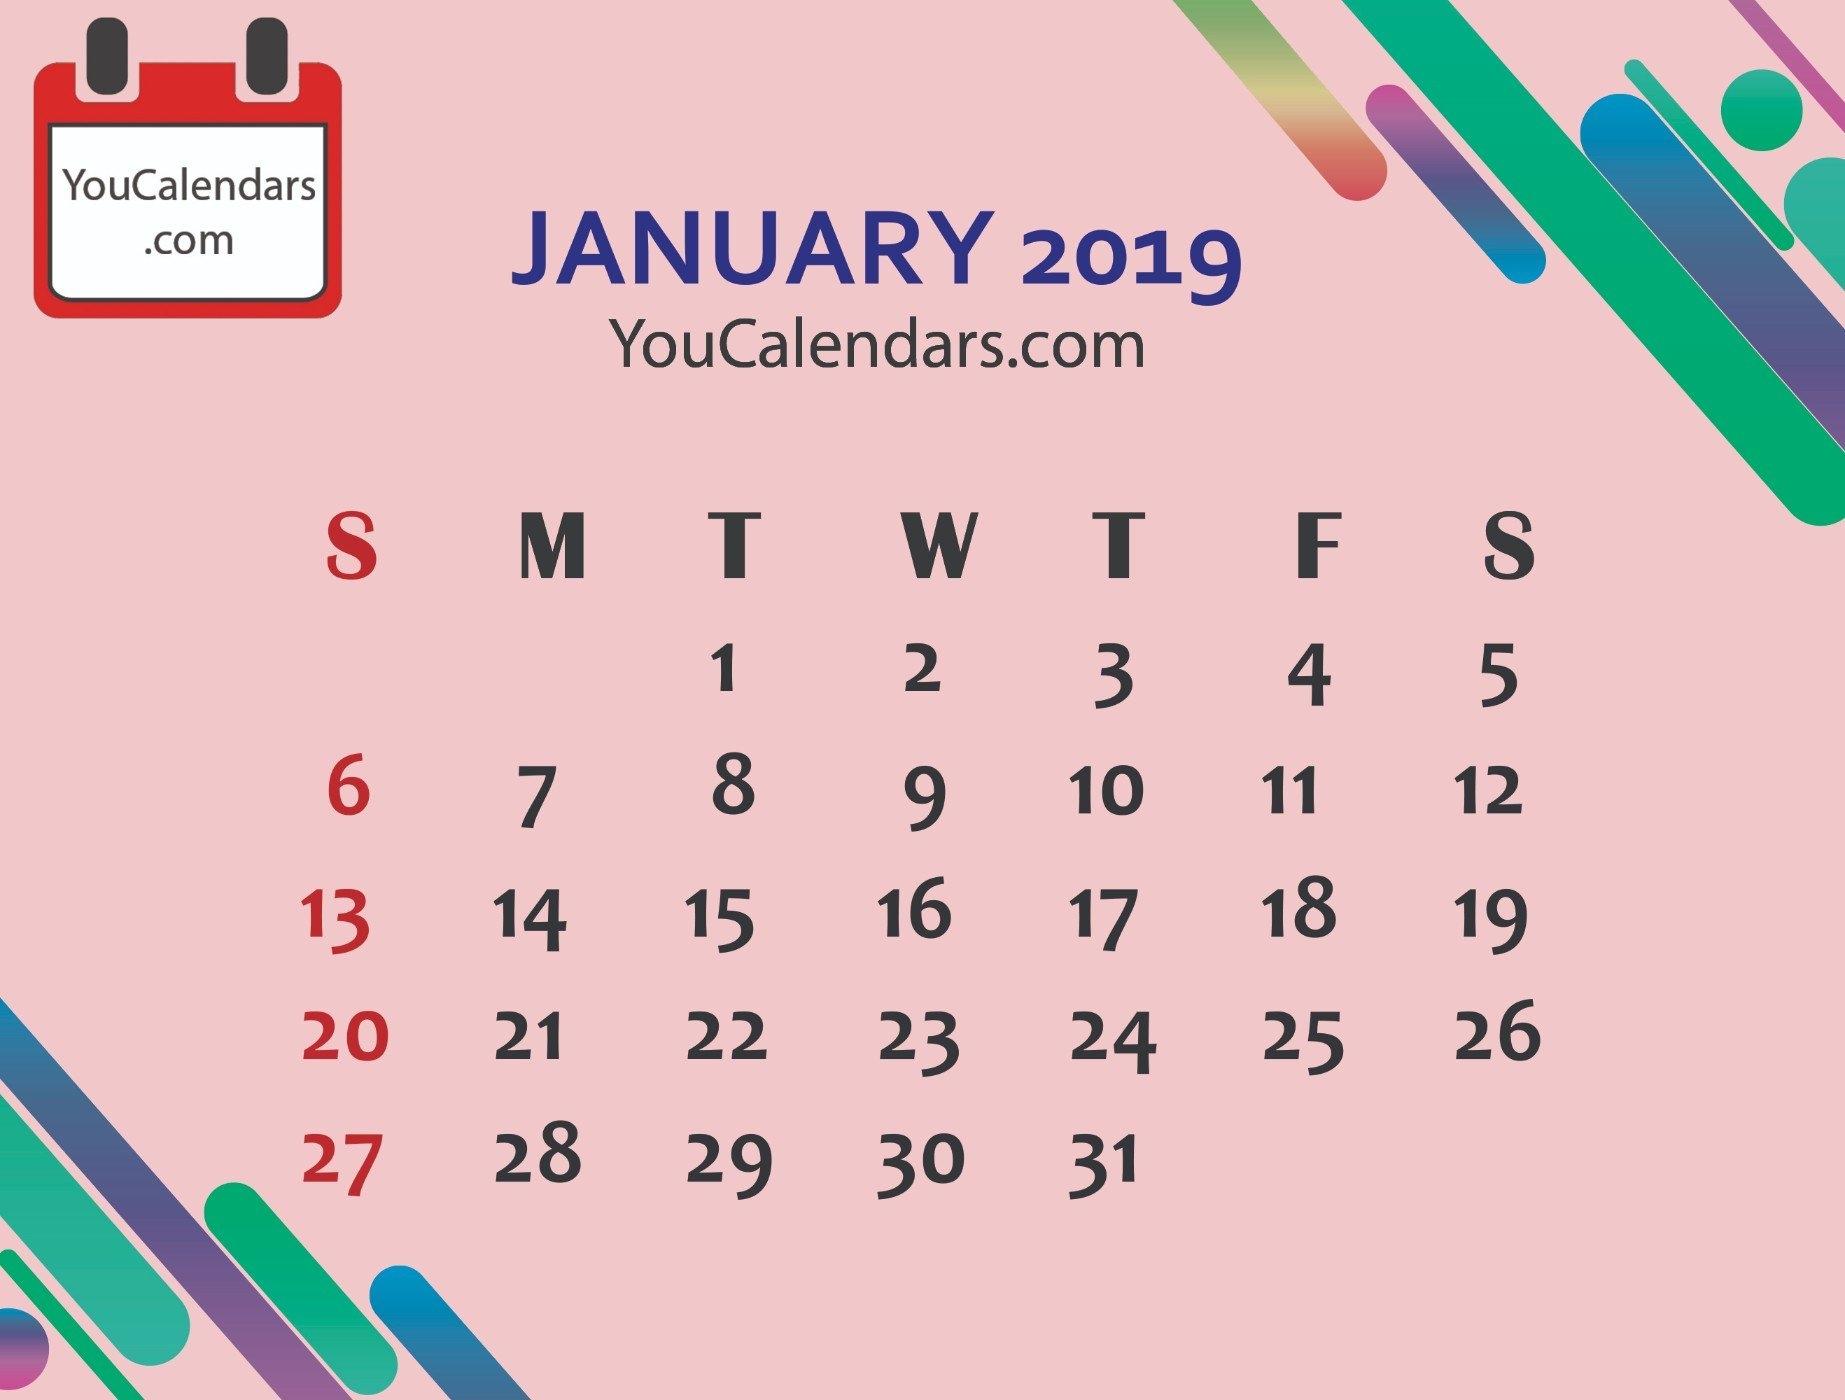 Free January 2019 Calendar Printable Template – You Calendars January 5 2019 Calendar